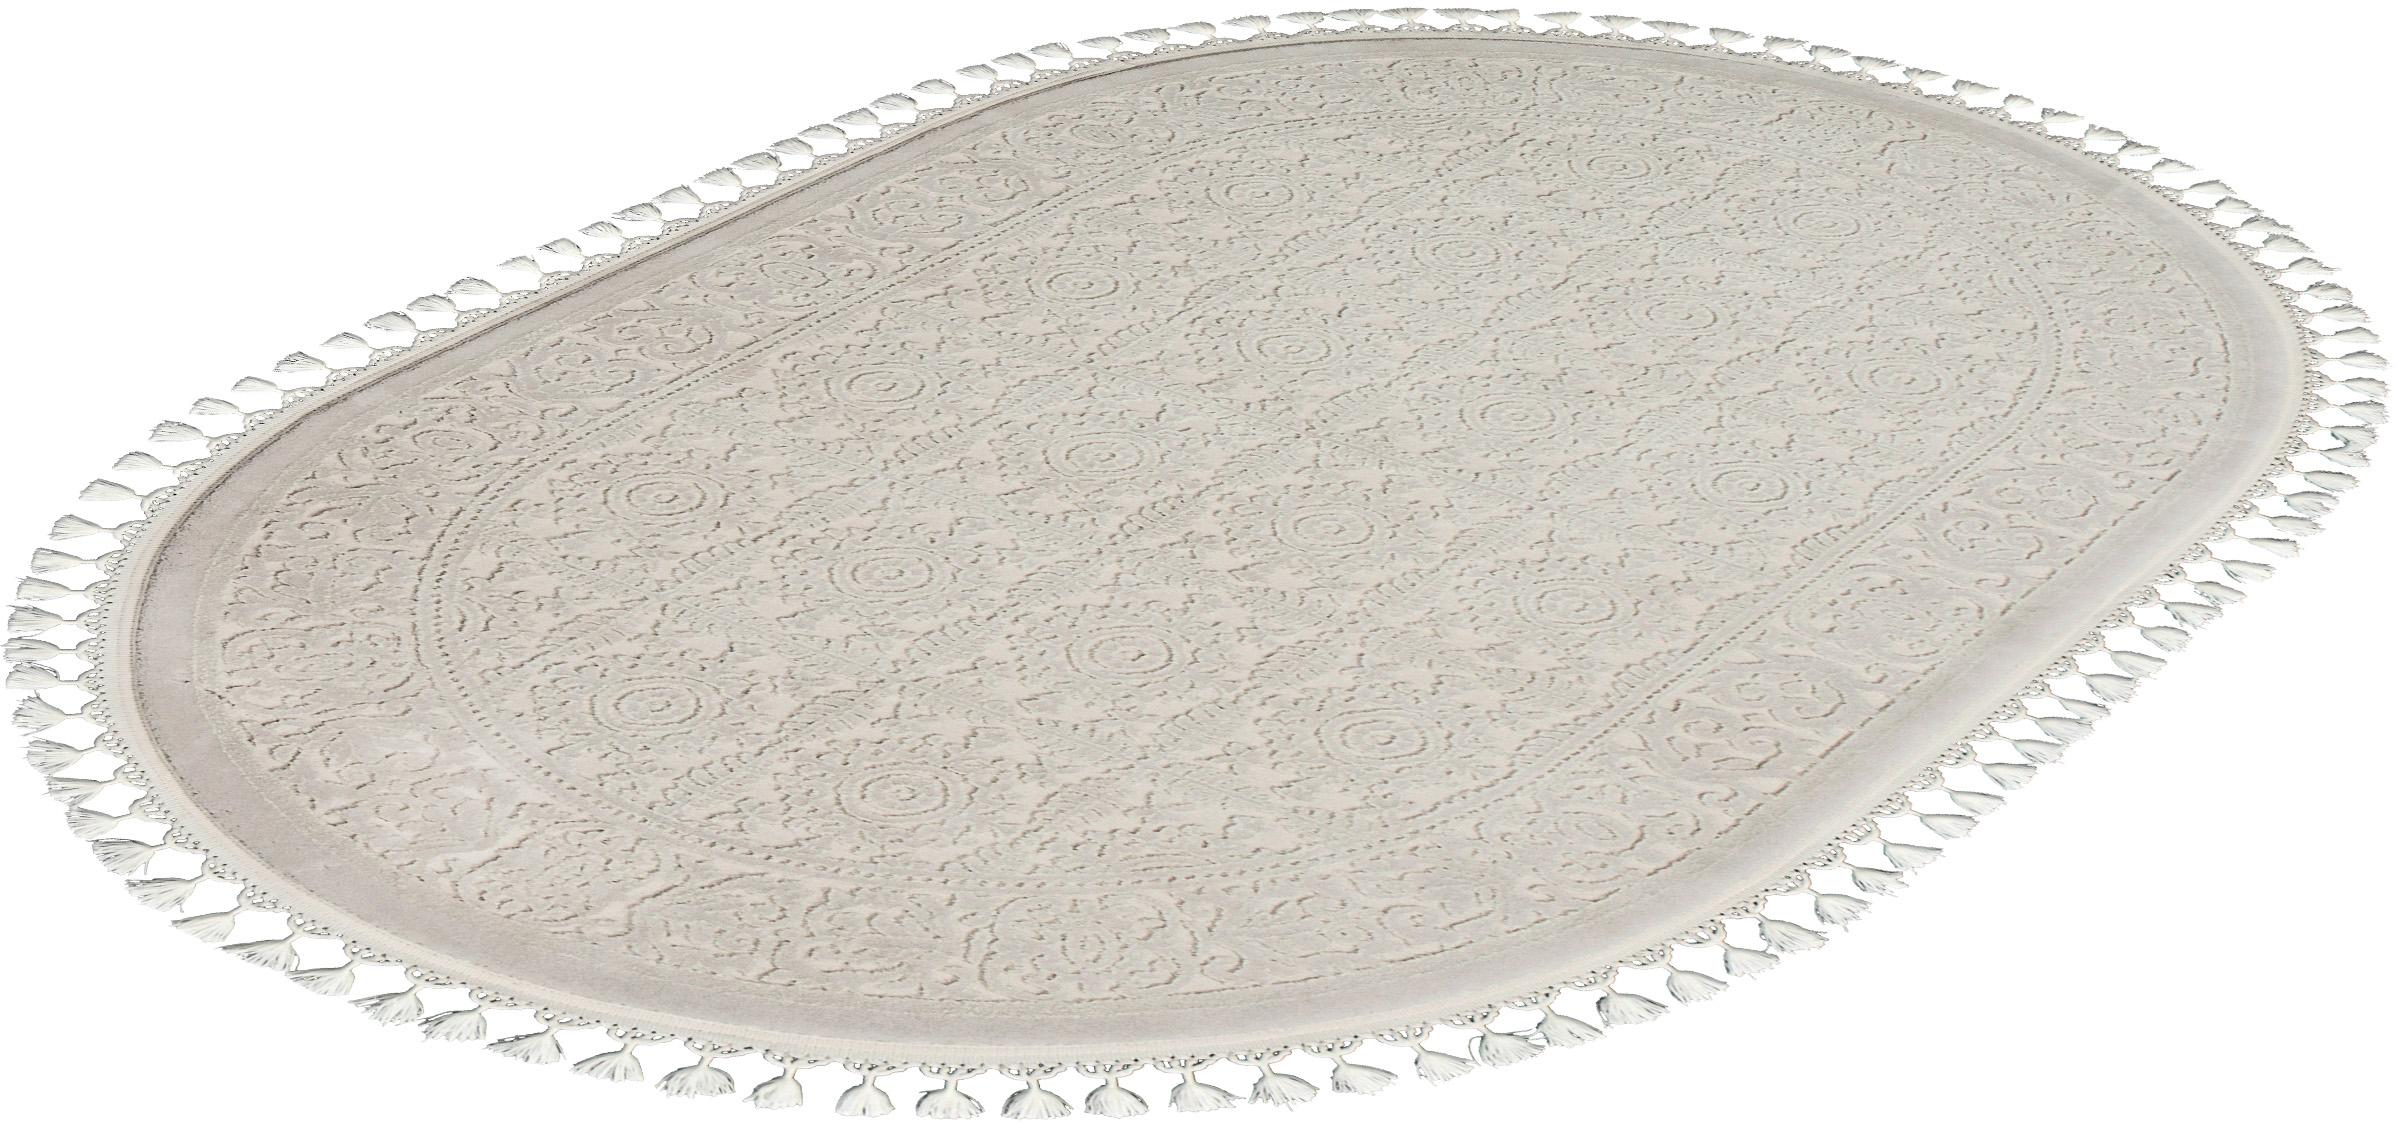 Orientteppich Delüks 6894 Sanat Teppiche oval Höhe 14 mm